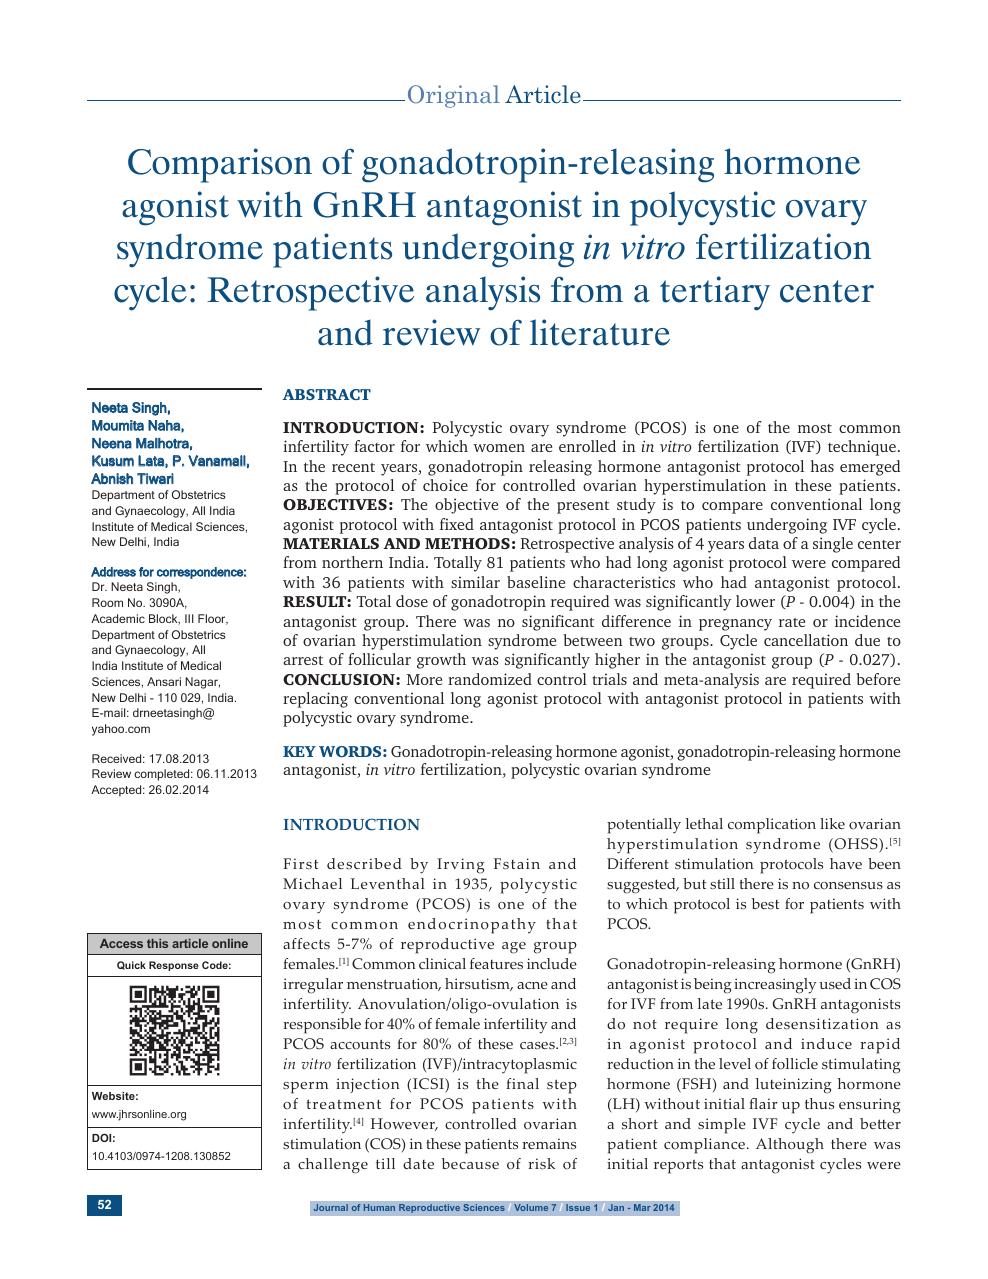 Comparison of gonadotropin-releasing hormone agonist with